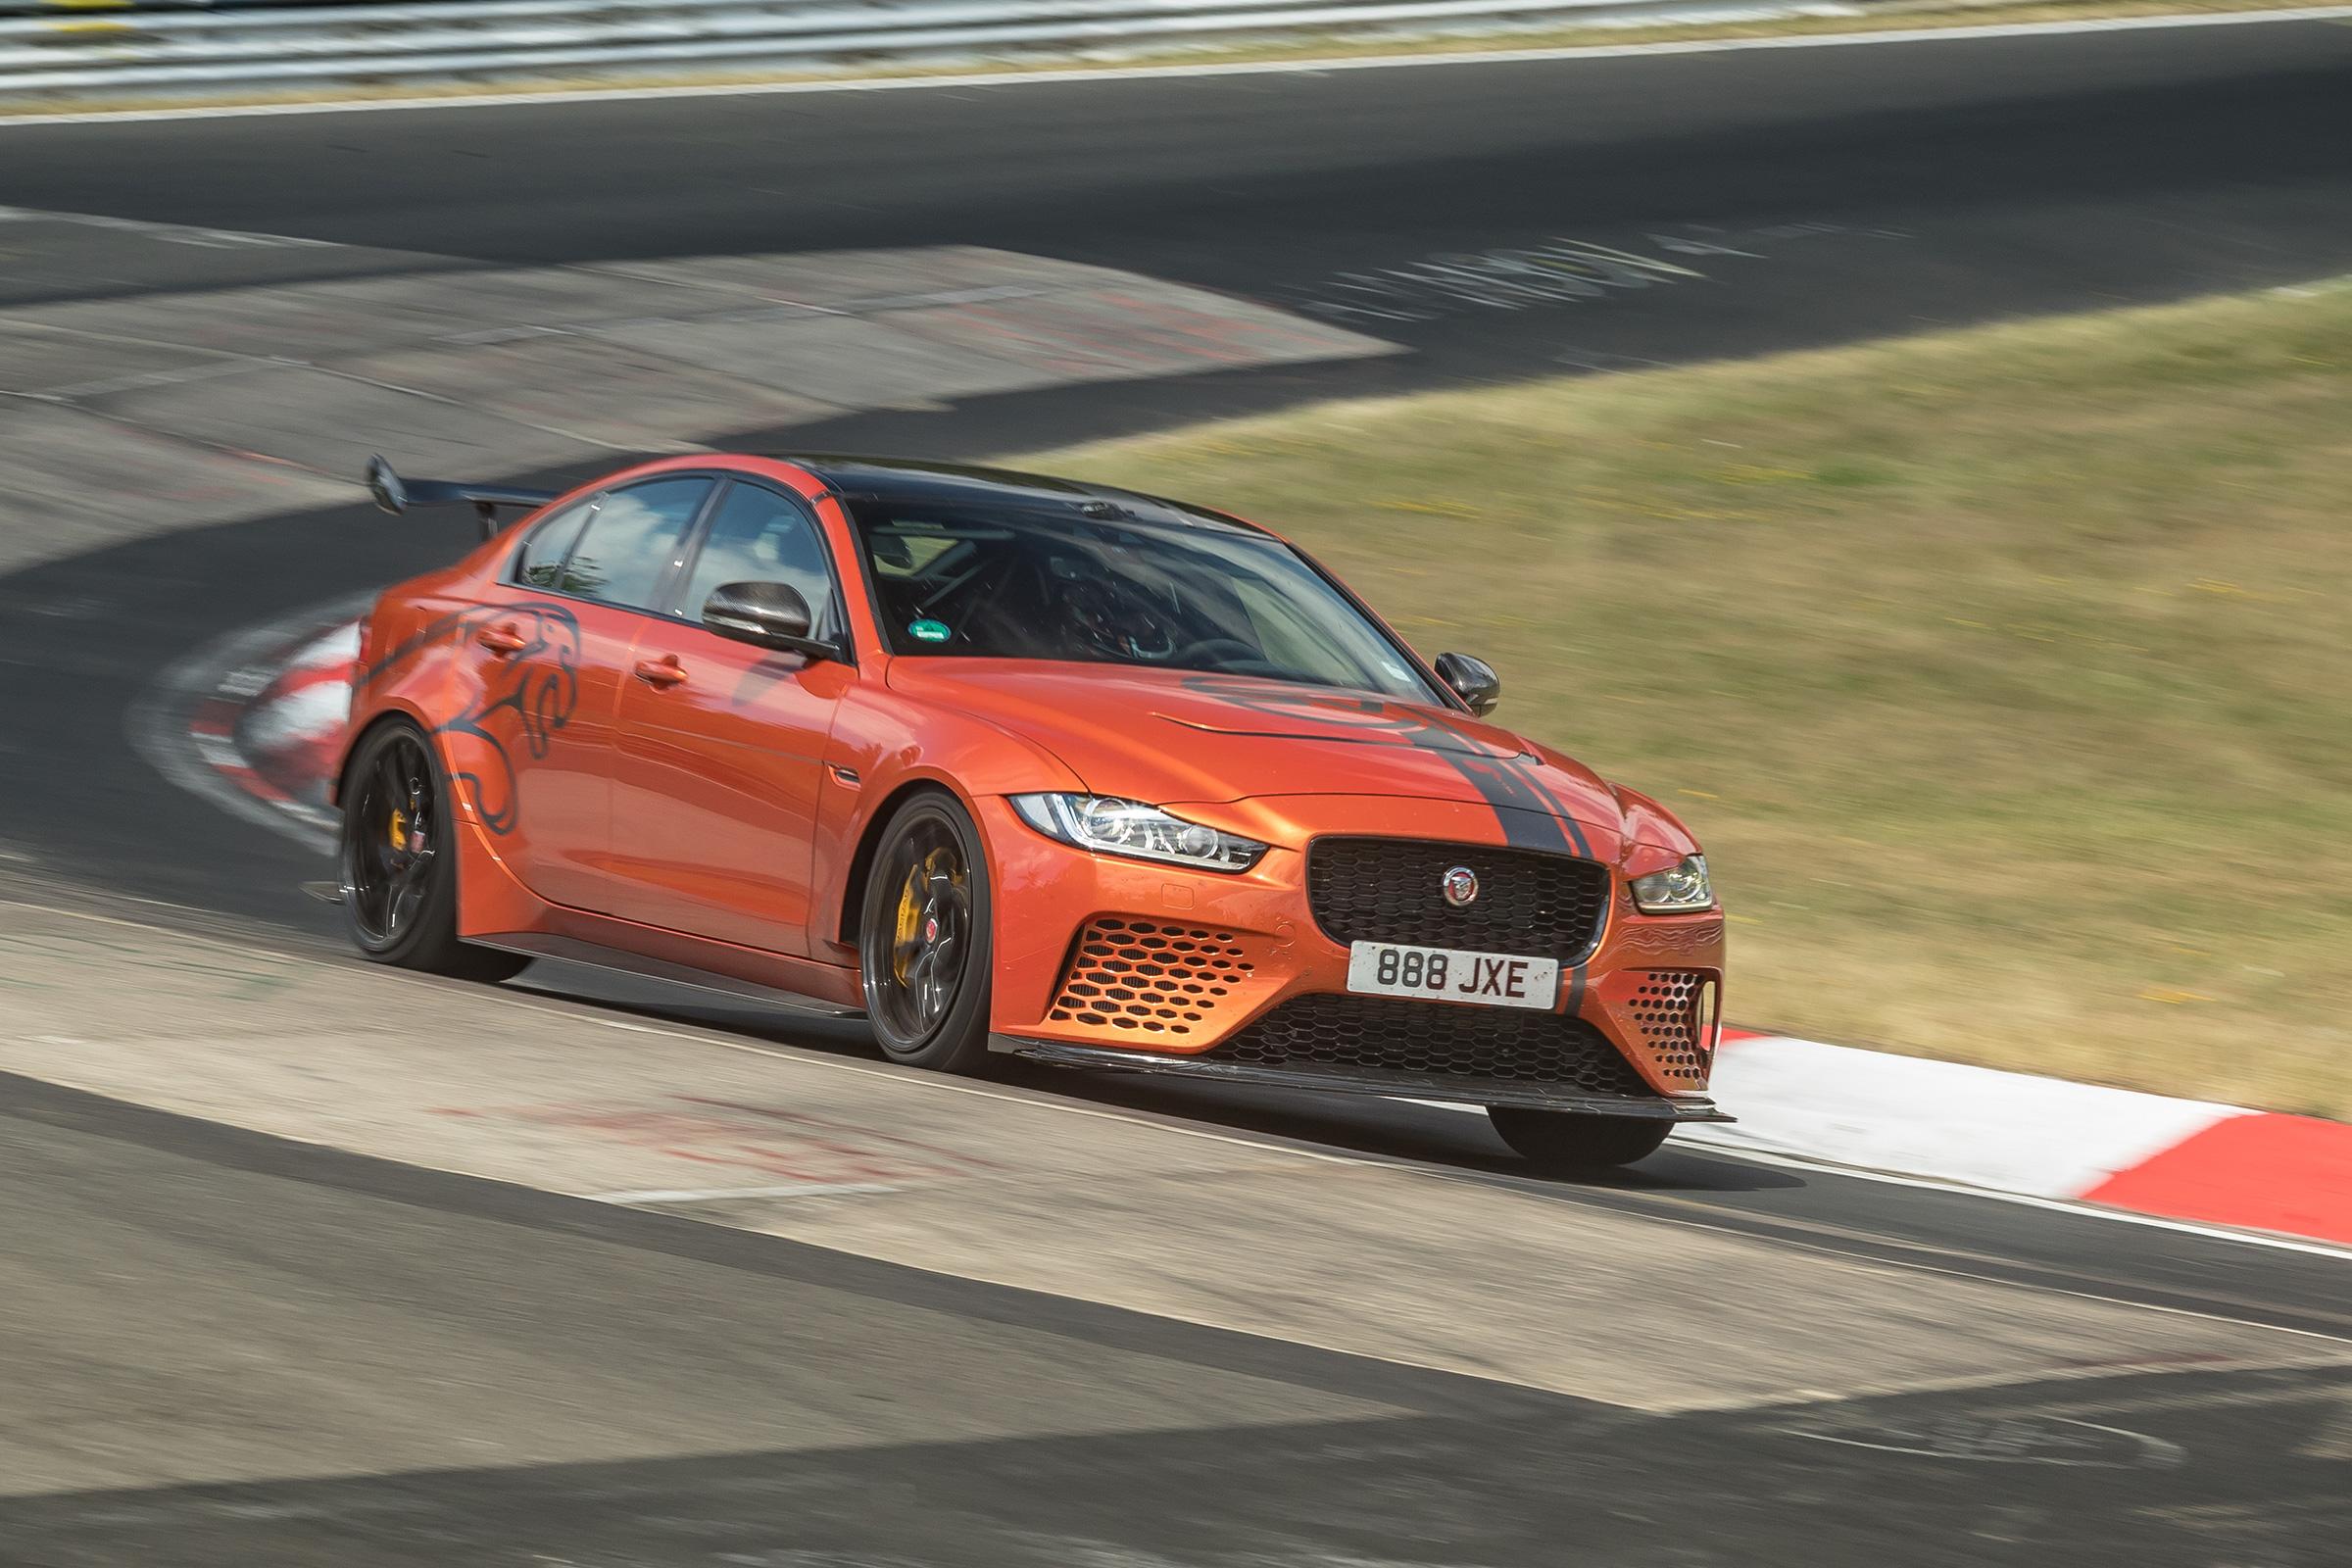 Audi Tt For Sale >> Jaguar XE SV Project 8 breaks Nurburgring record, again | Evo